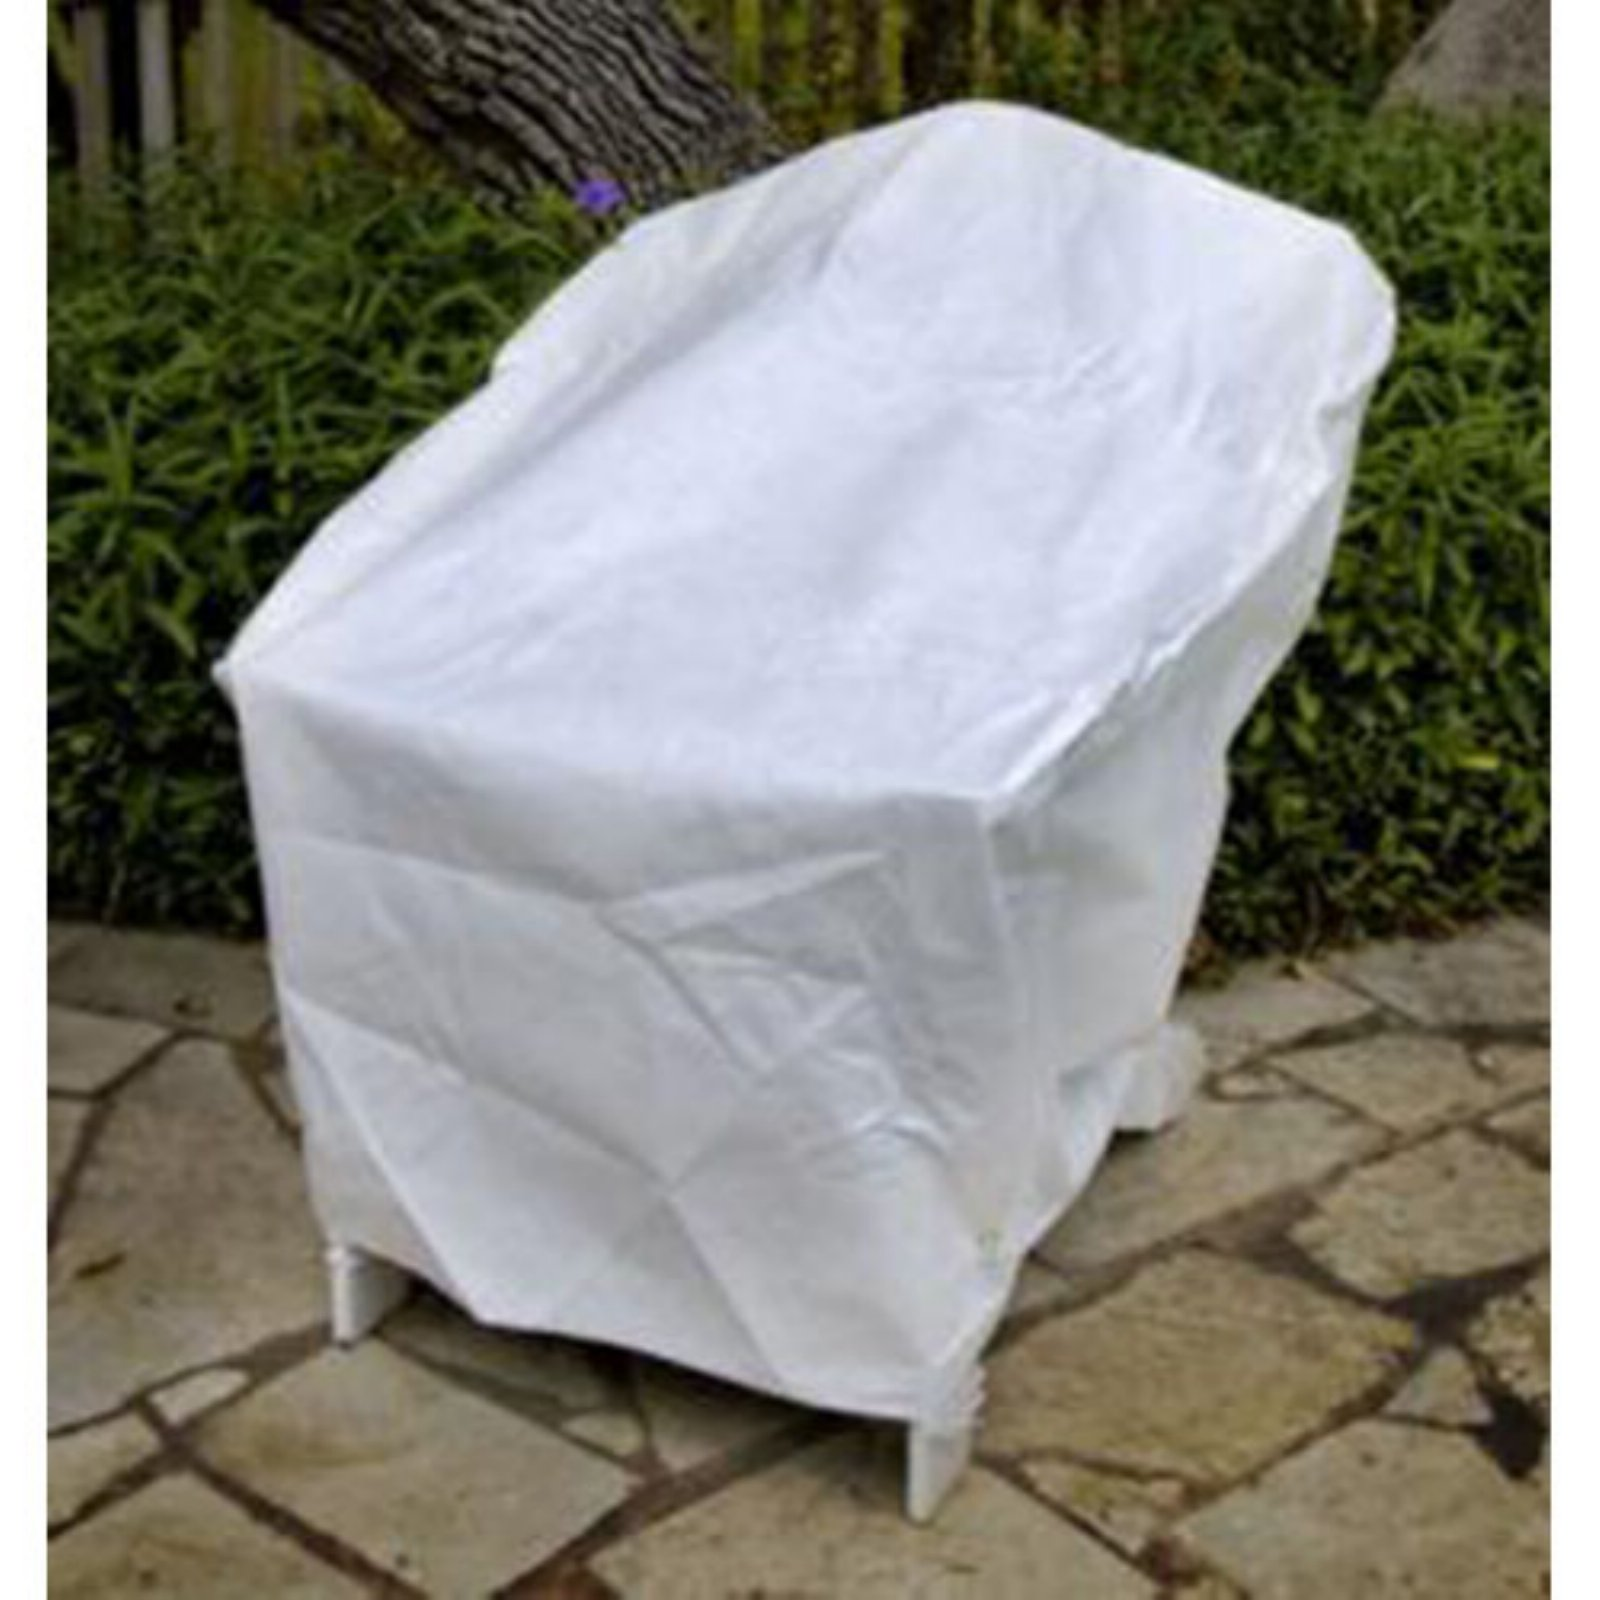 KoverRoos DuPont Tyvek White Adirondack Chair Cover by KoverRoos